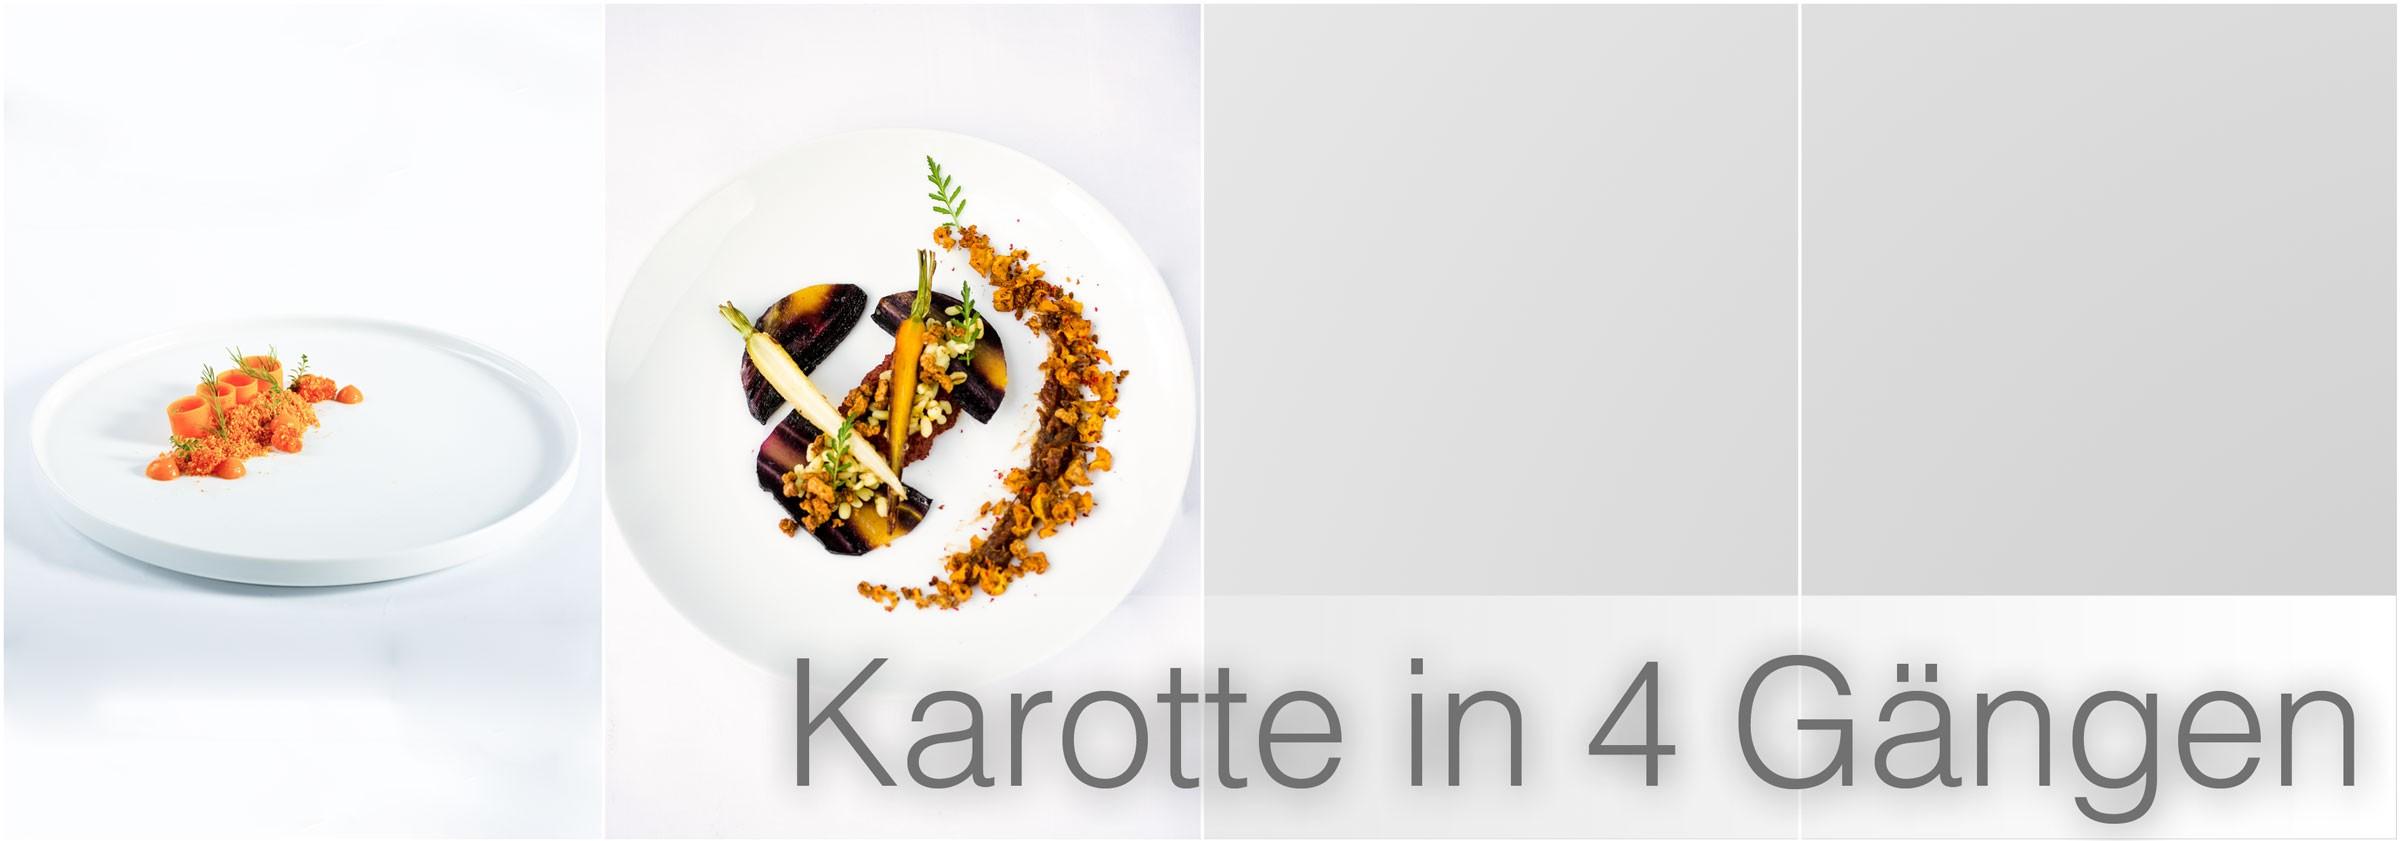 Karotte-in-4-Gängen-2-groß